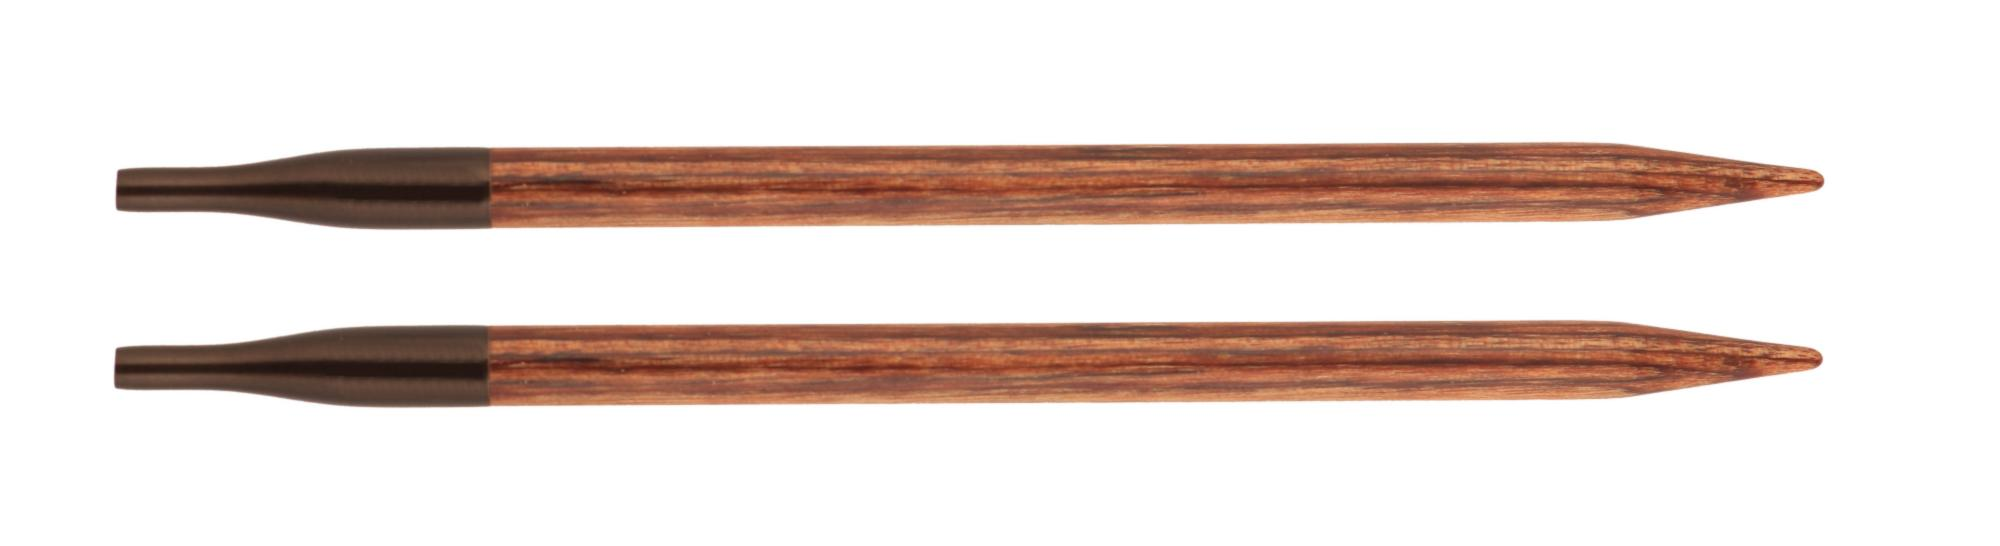 31224 Спицы съемные короткие 3.75 мм Ginger KnitPro